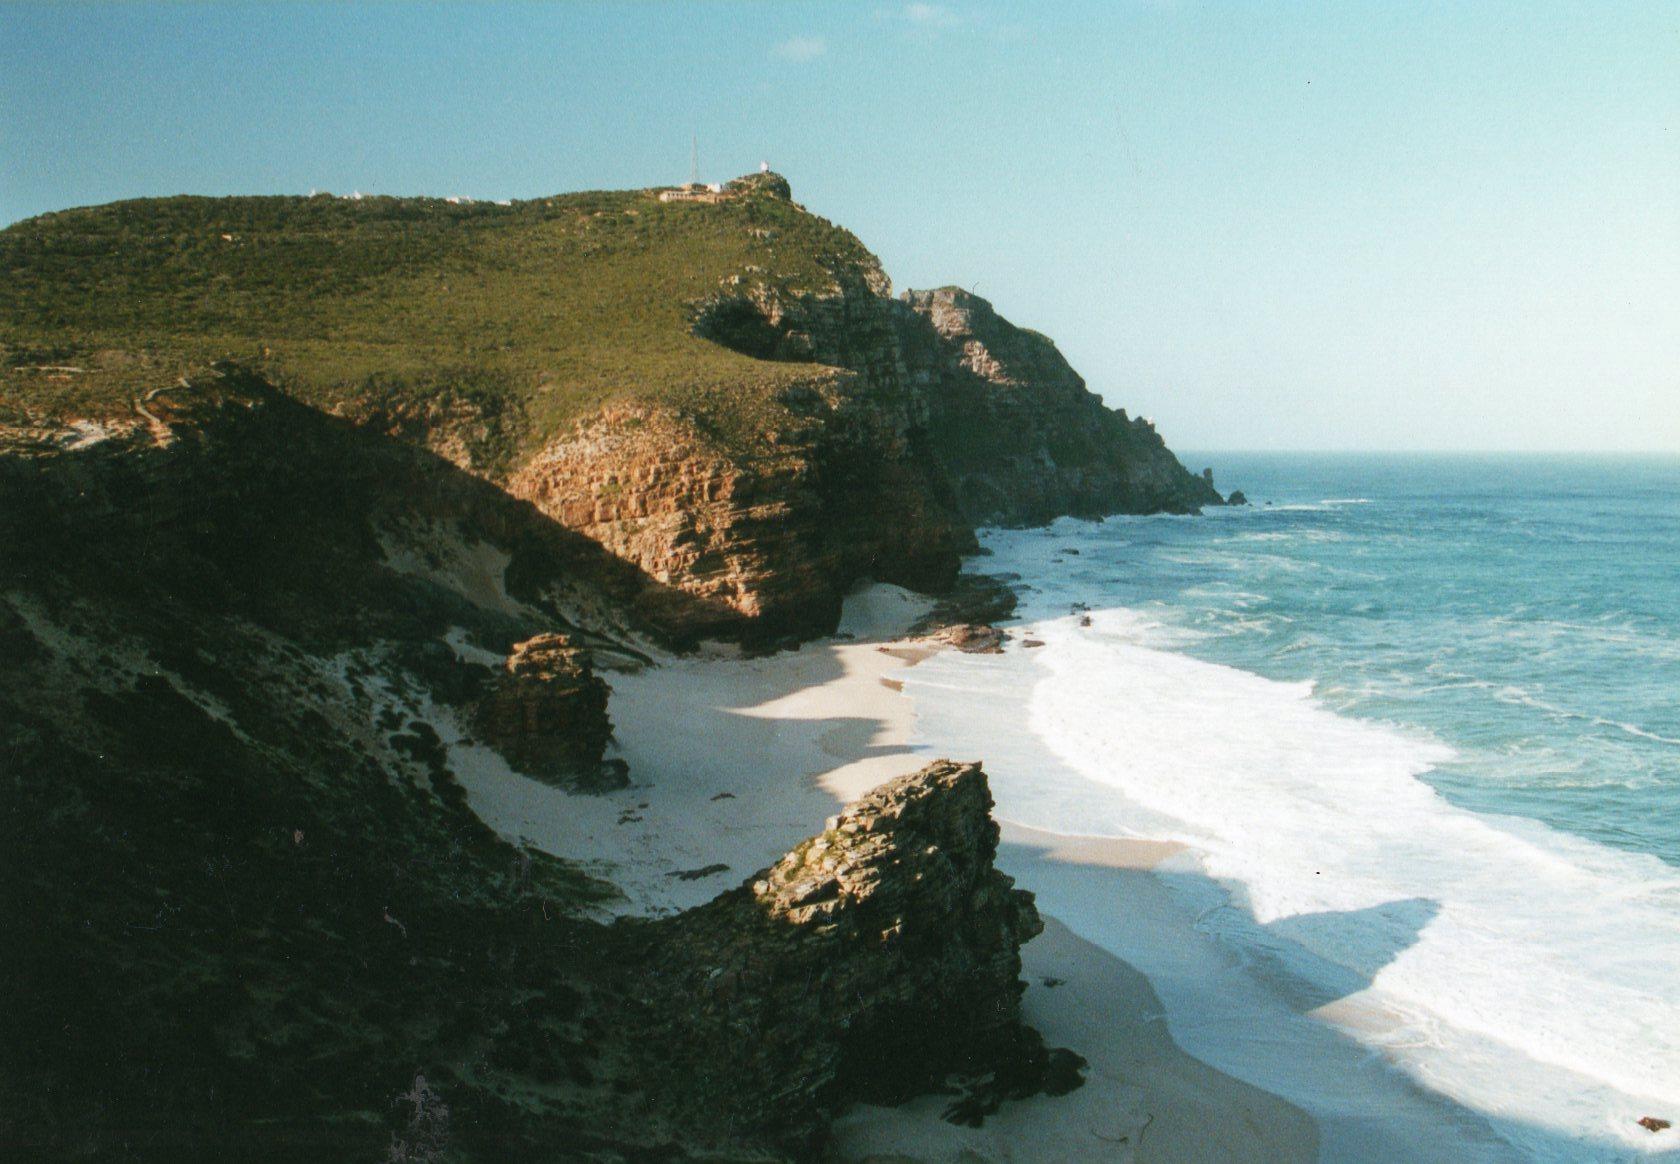 South Africa Western Cape Cape Area, Cape of Good Hope, Back toward Cape Point, Walkopedia